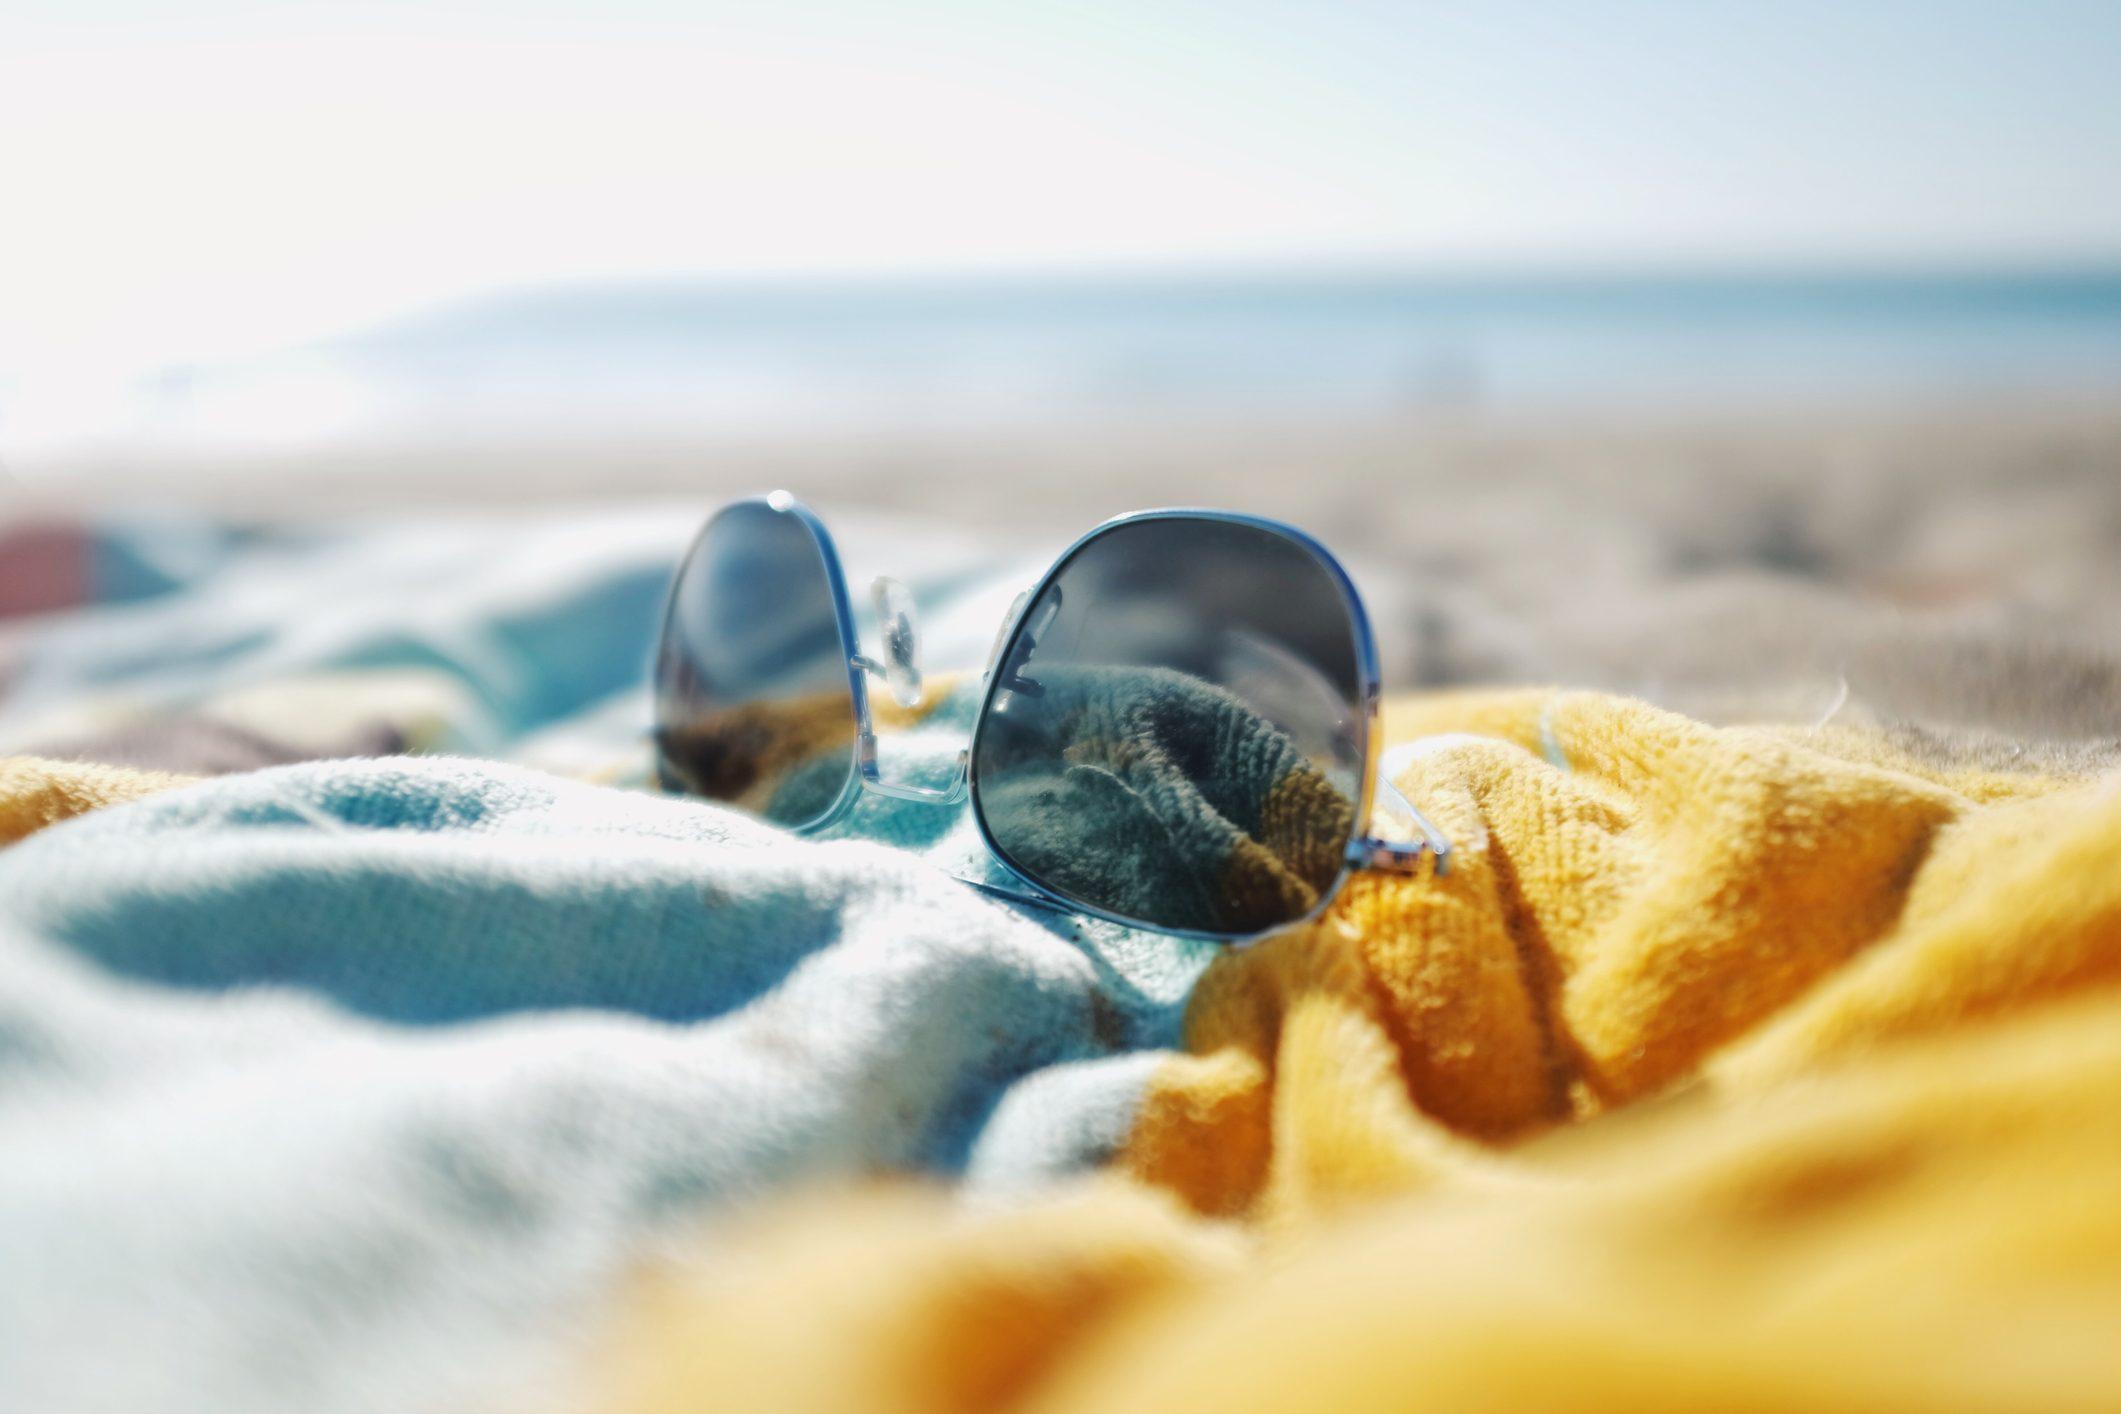 sunglasses laying on beach towel on the beach